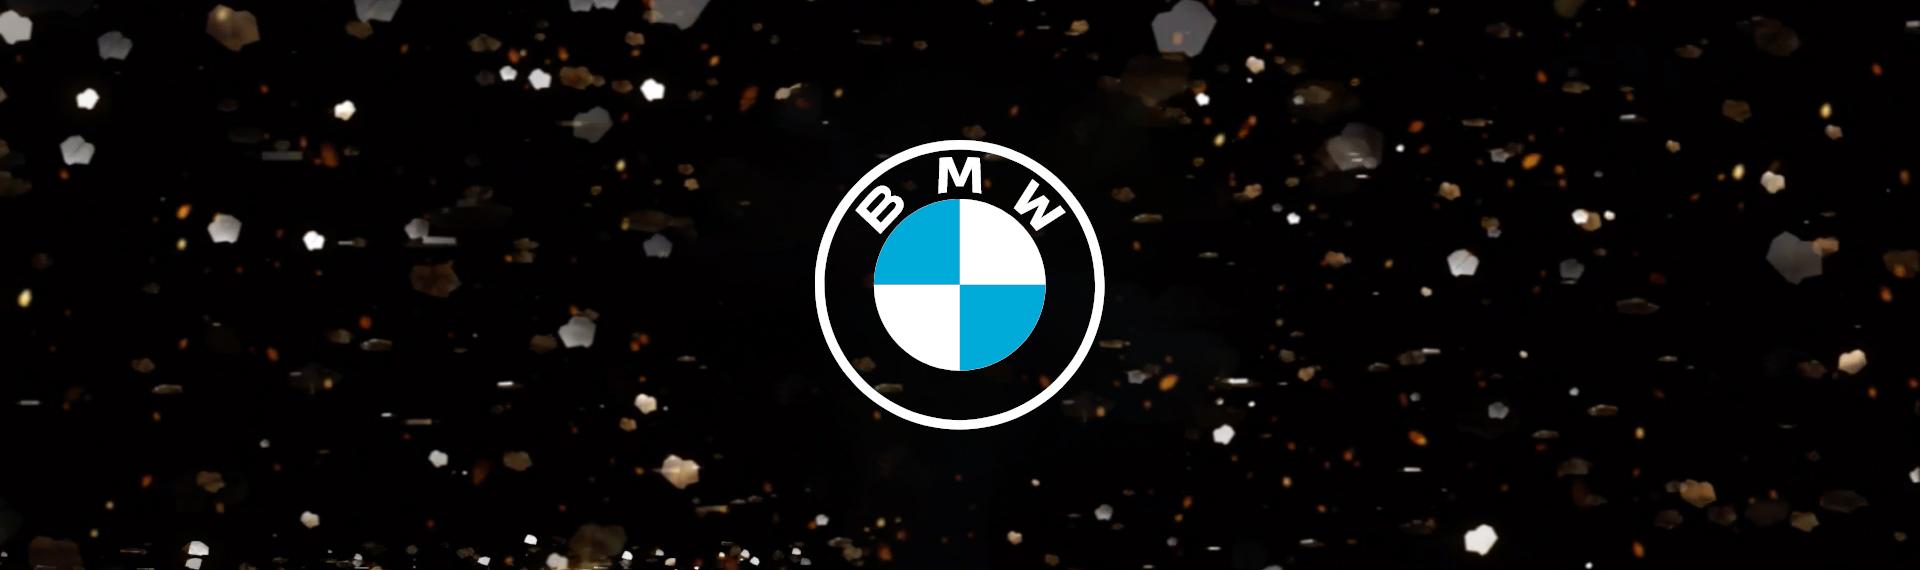 BMW Roundel (Logo)